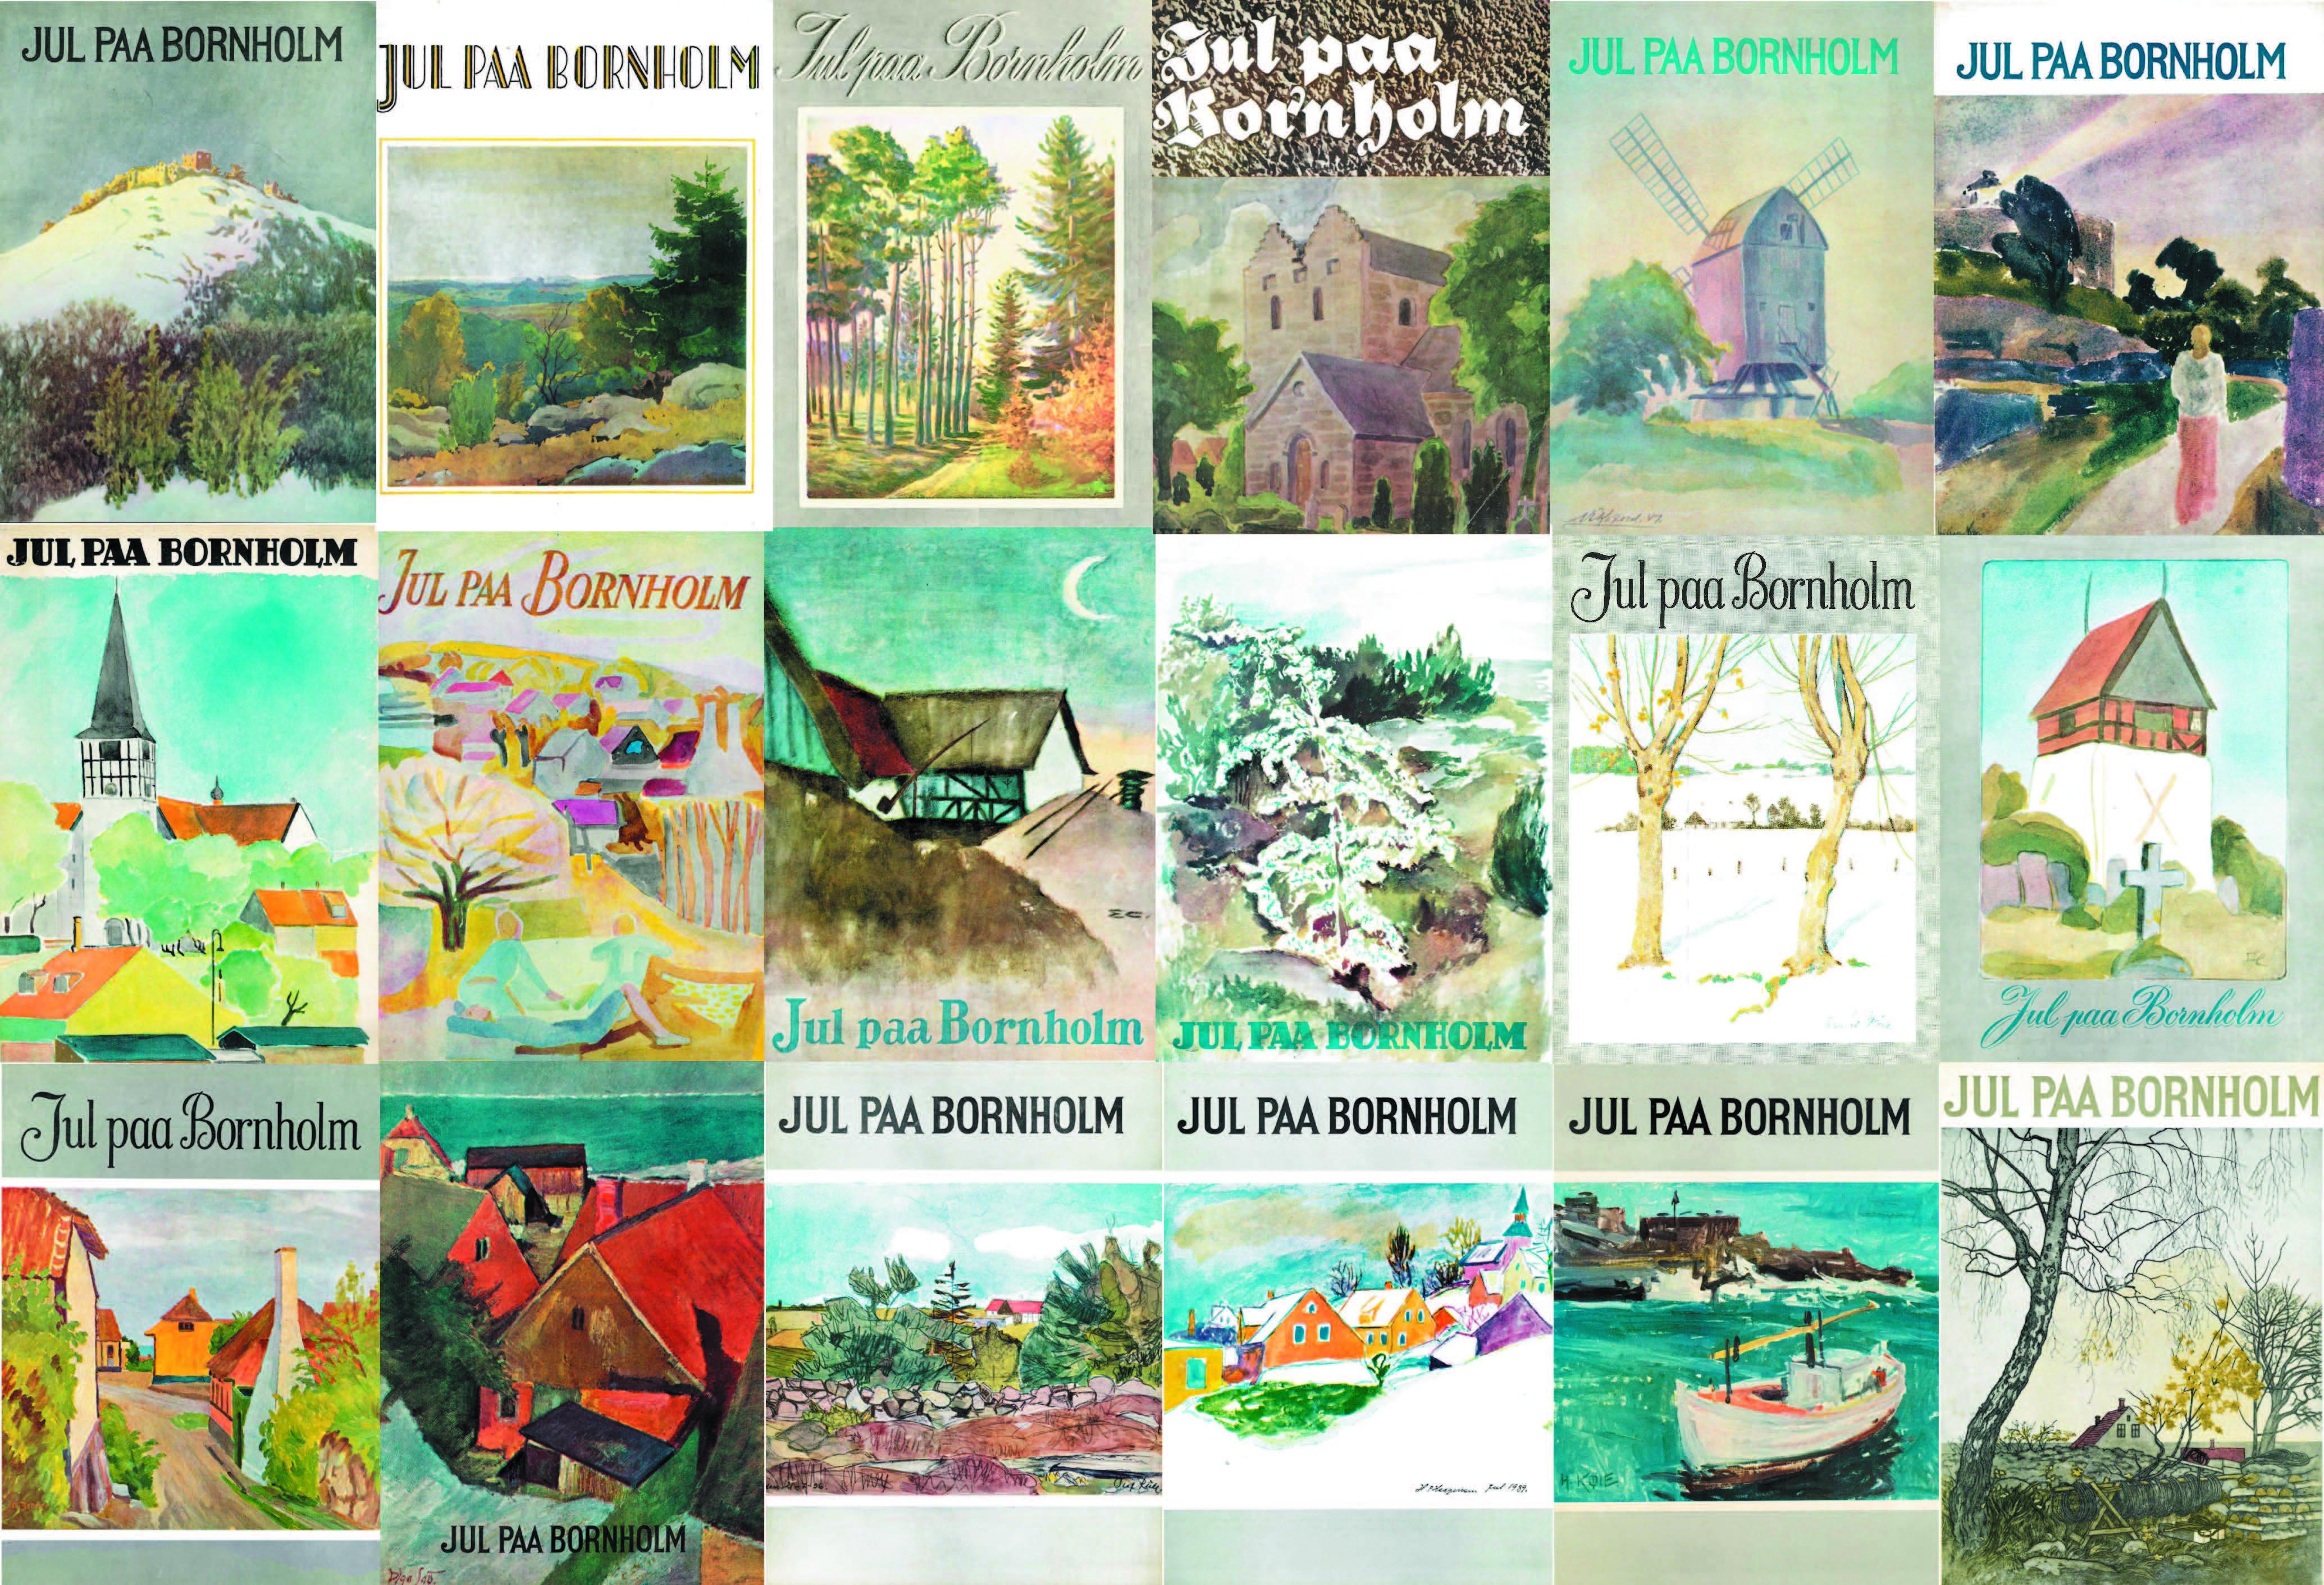 Jul paa Bornholm 1943-1960